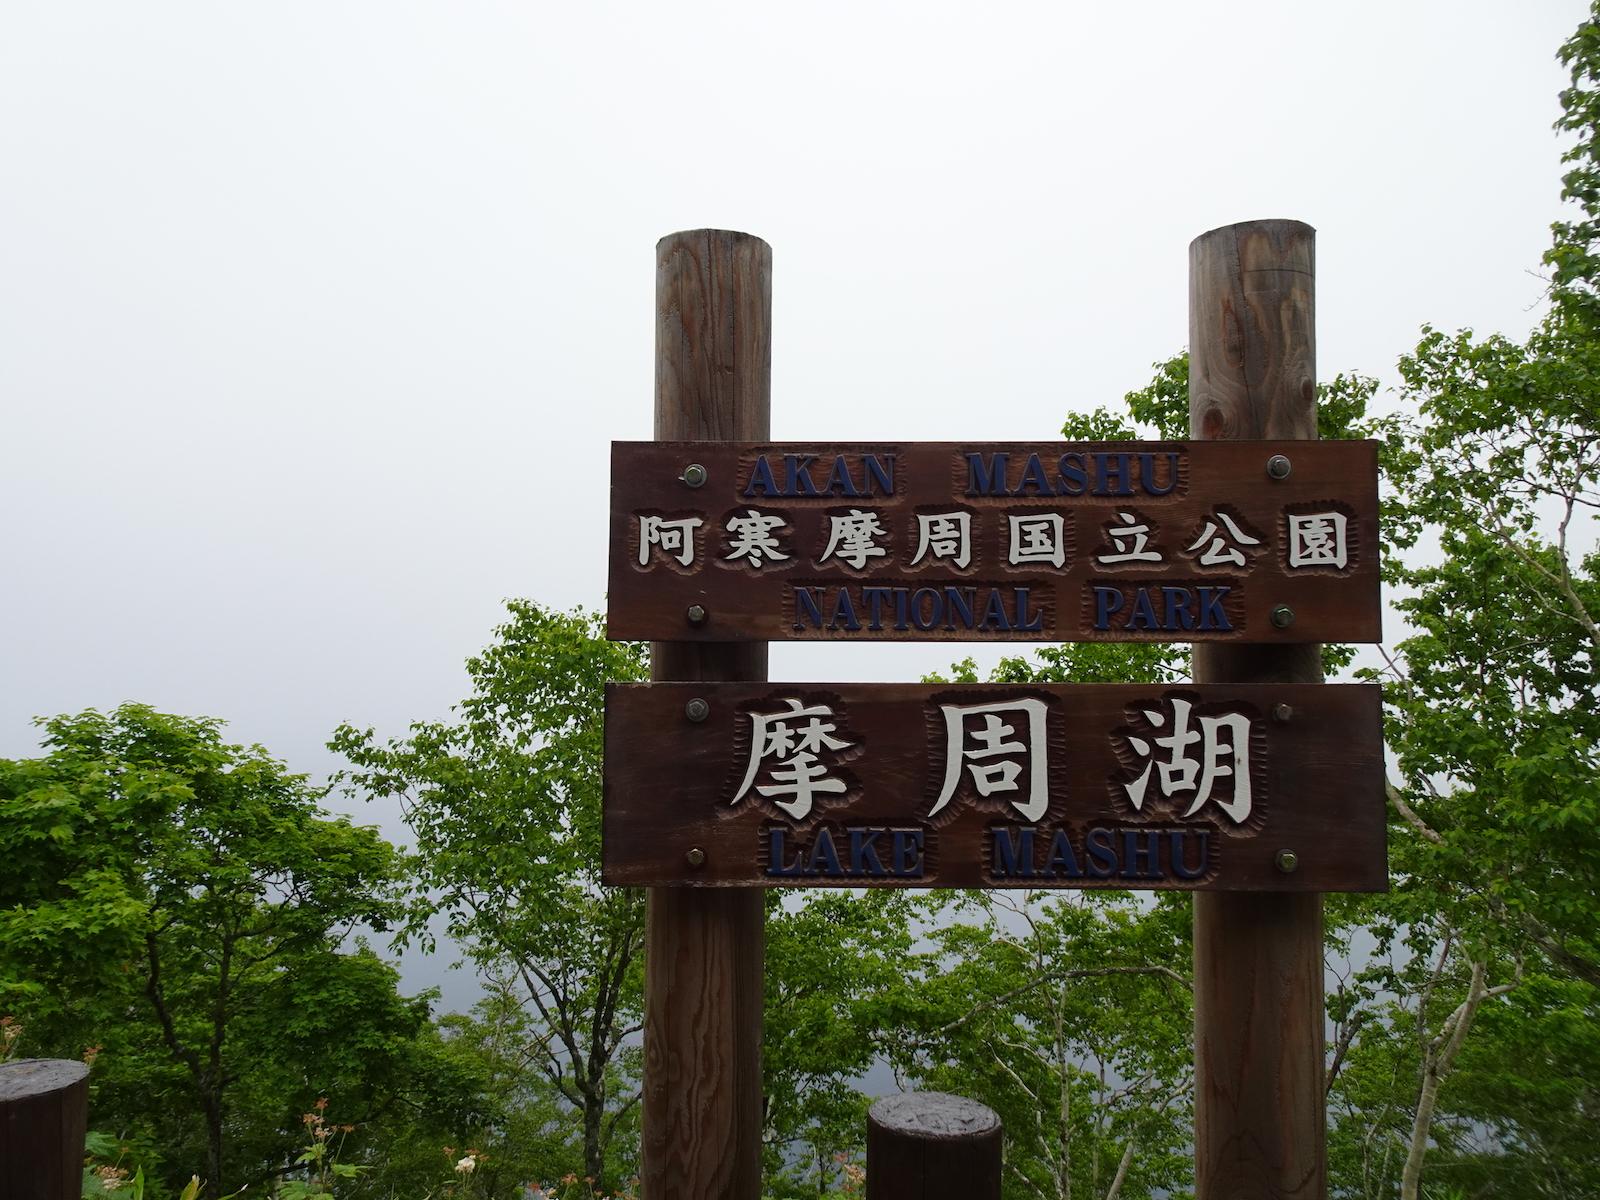 f:id:yasuaki:20190707121305j:plain